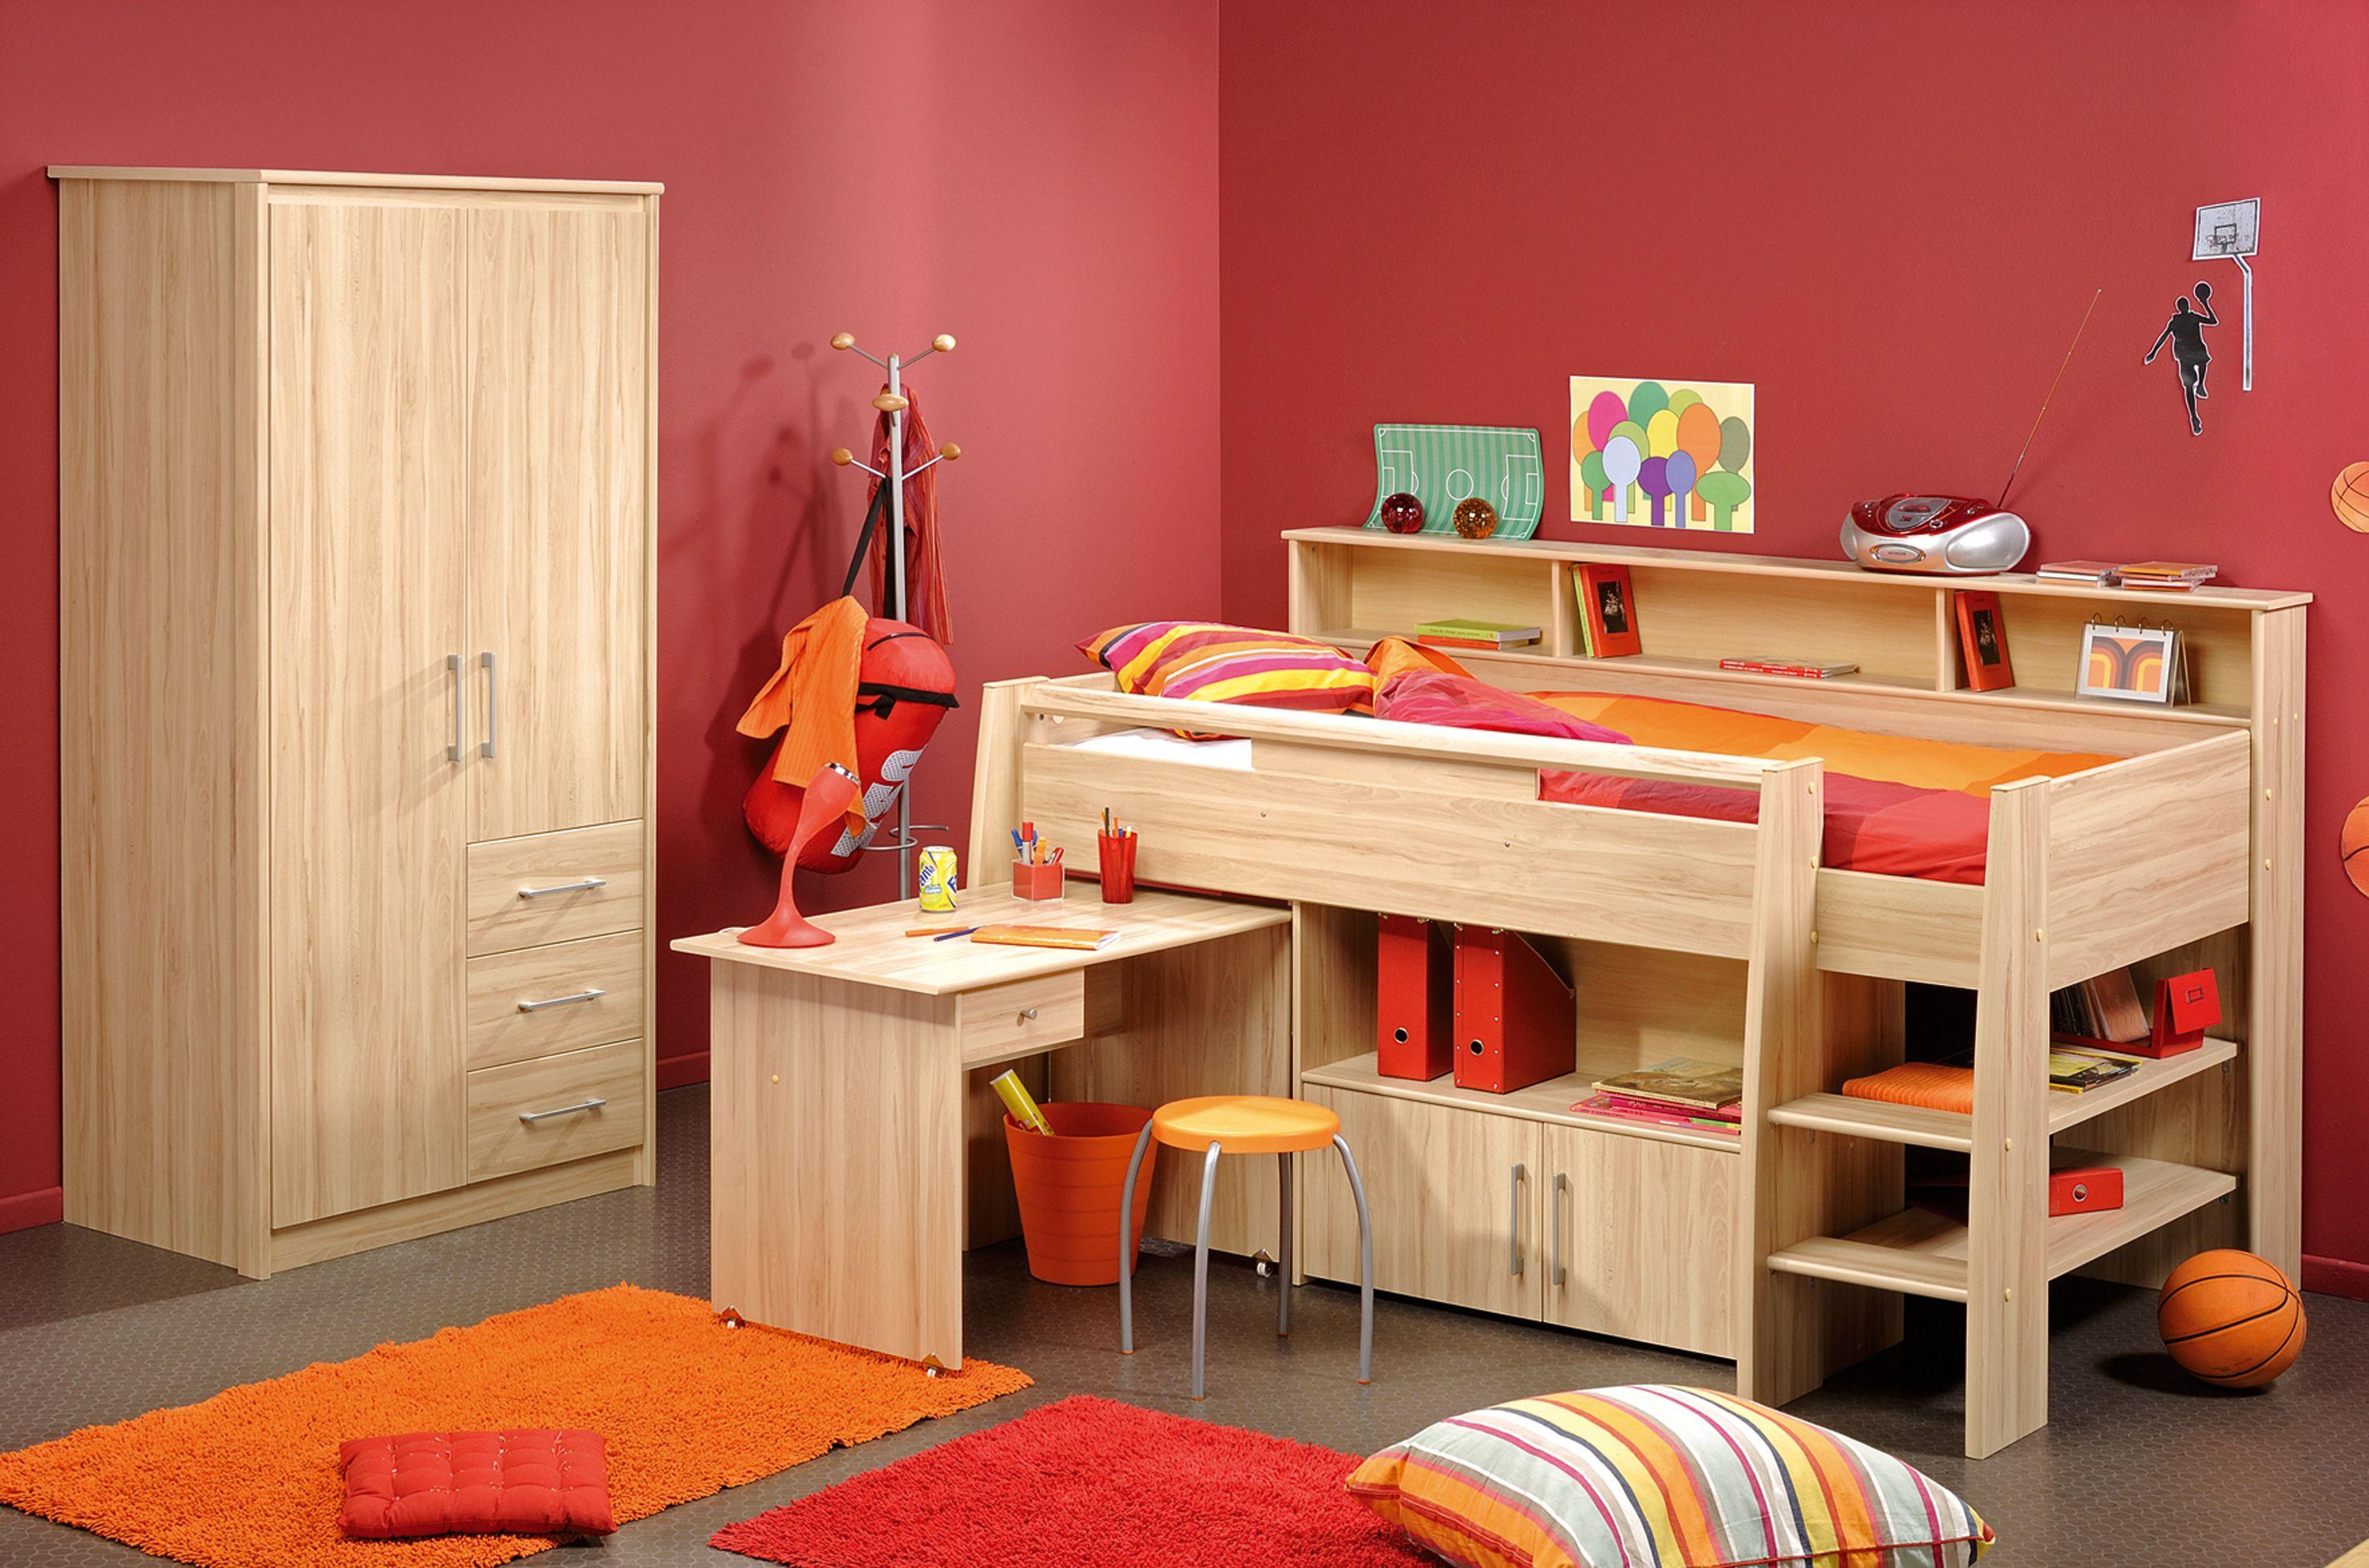 Povisana Postelja Kurt Cabin Bed With Desk Girls Loft Bed Teenage Bedroom Furniture